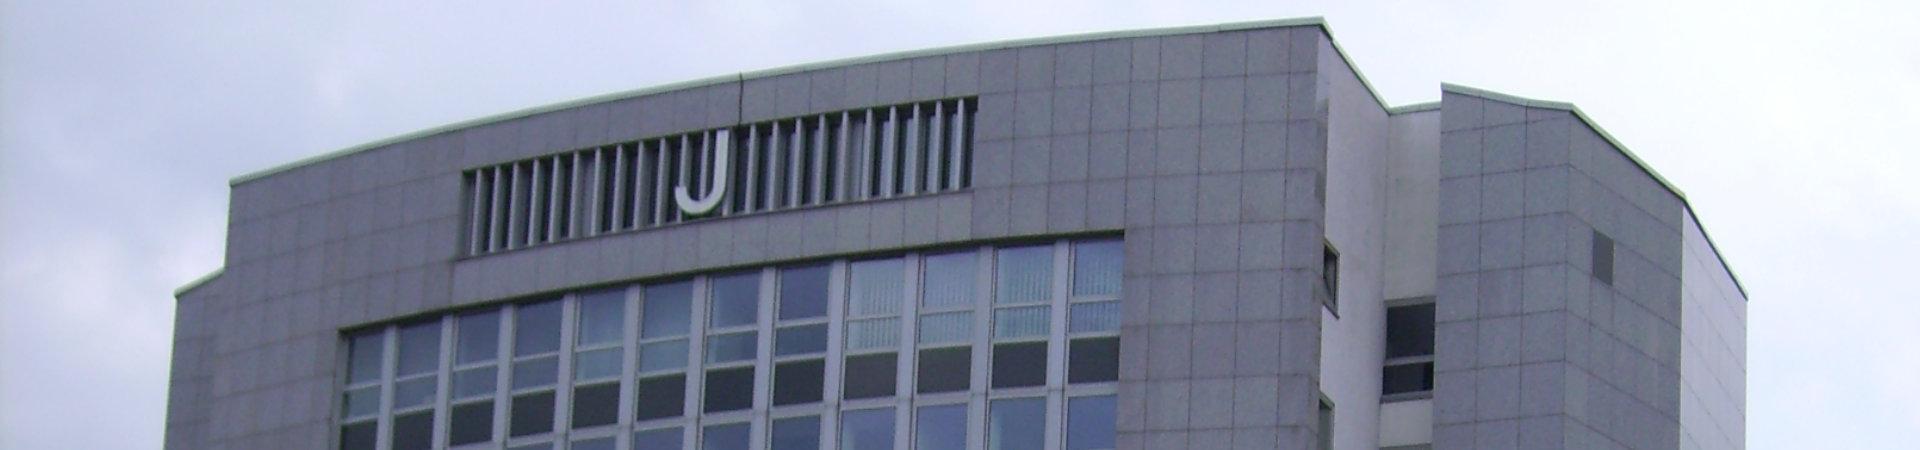 Ingenieurbüro Hammes - Viersen / Mönchengladbach - Neubau Hochhaus